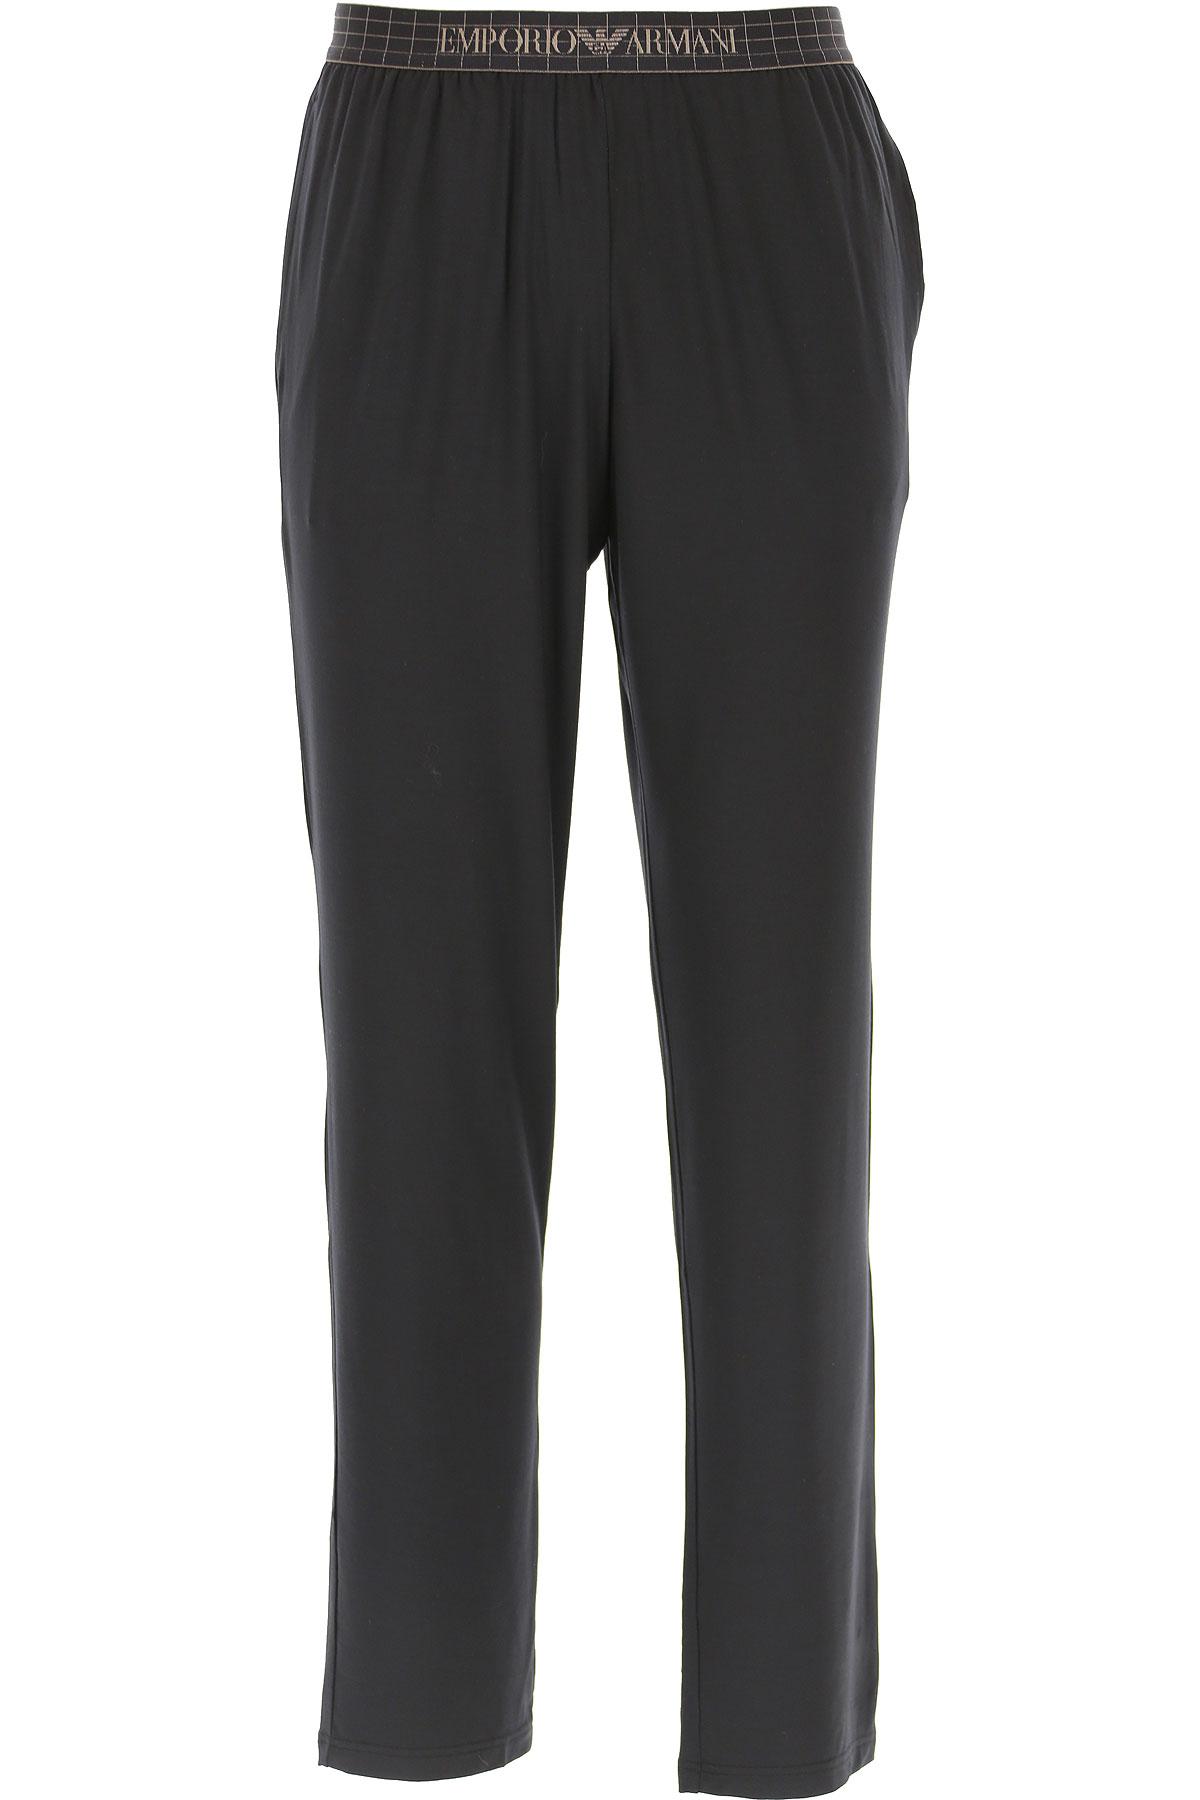 Emporio Armani Loungewear for Men, Black, Modal, 2019, M (IT 4) S (IT 3) XL (IT 6)